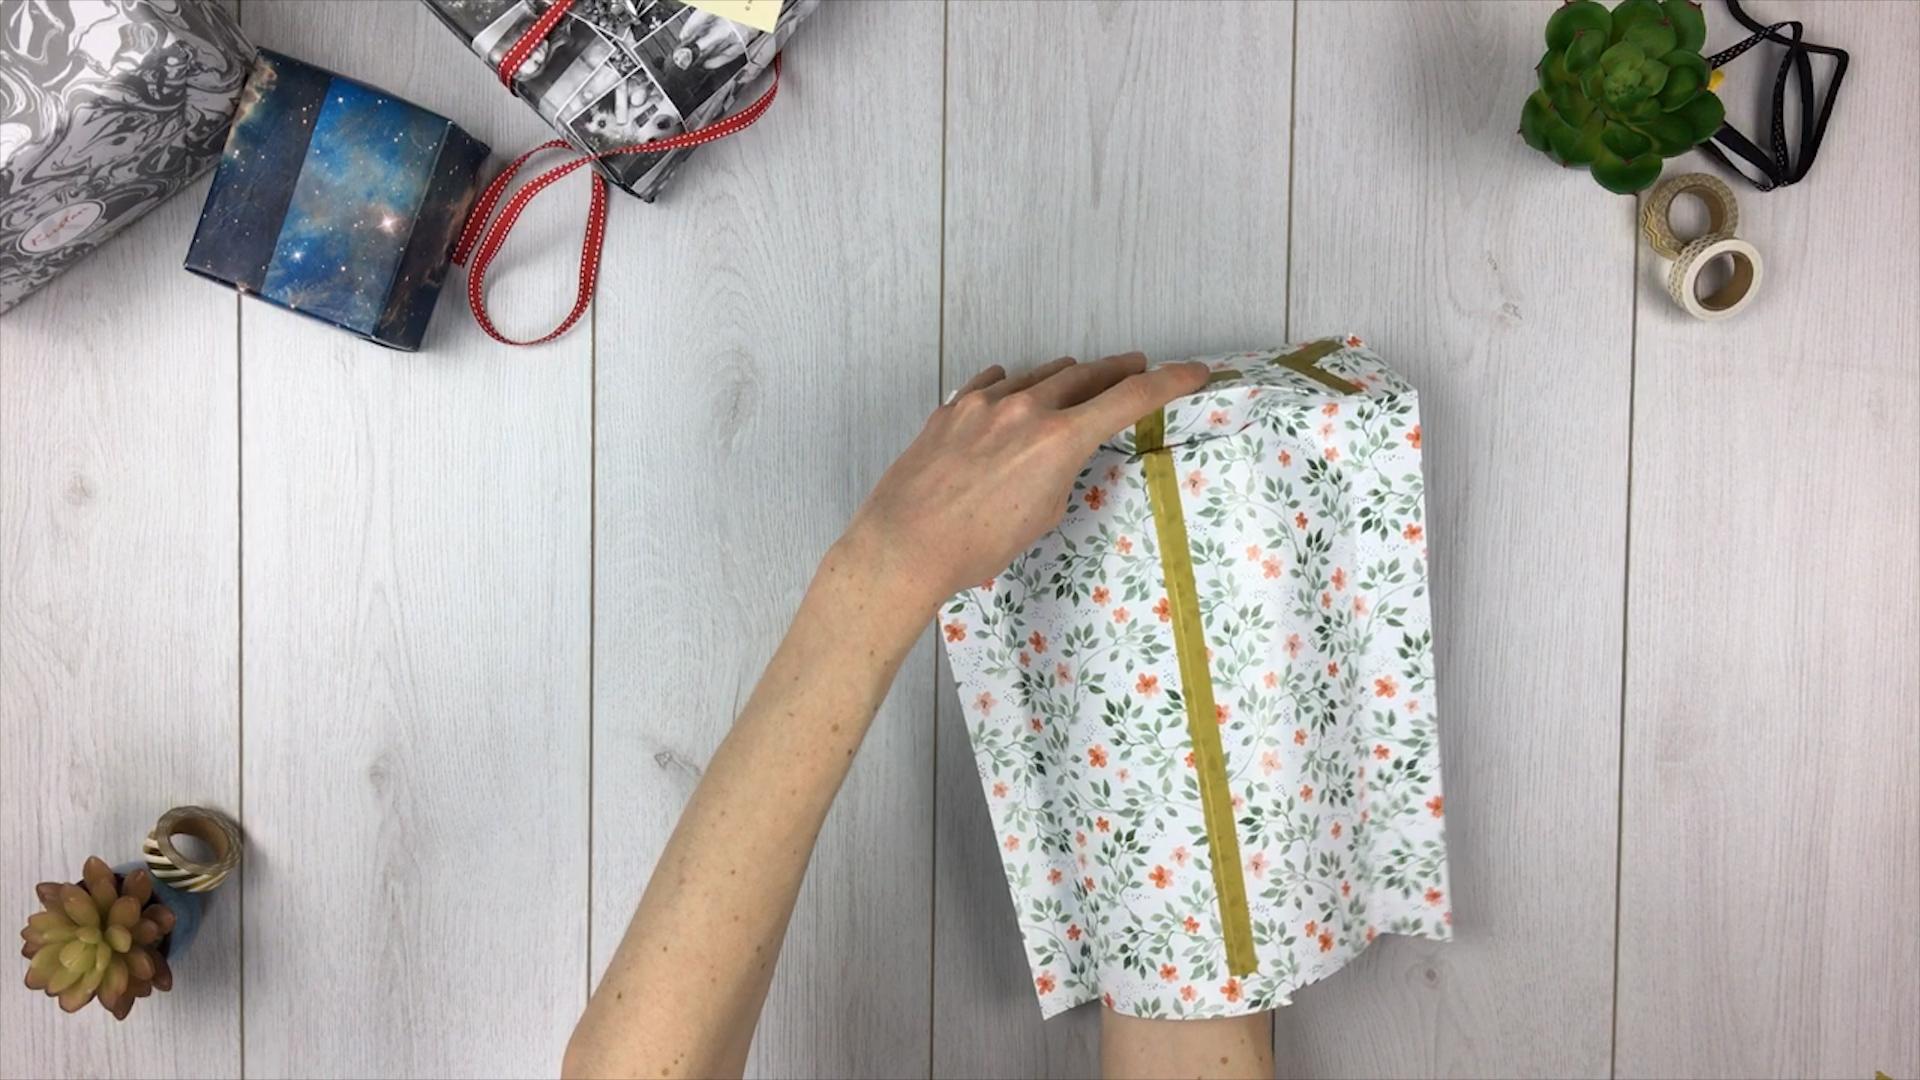 Geschenktüte basteln - Schritt 8